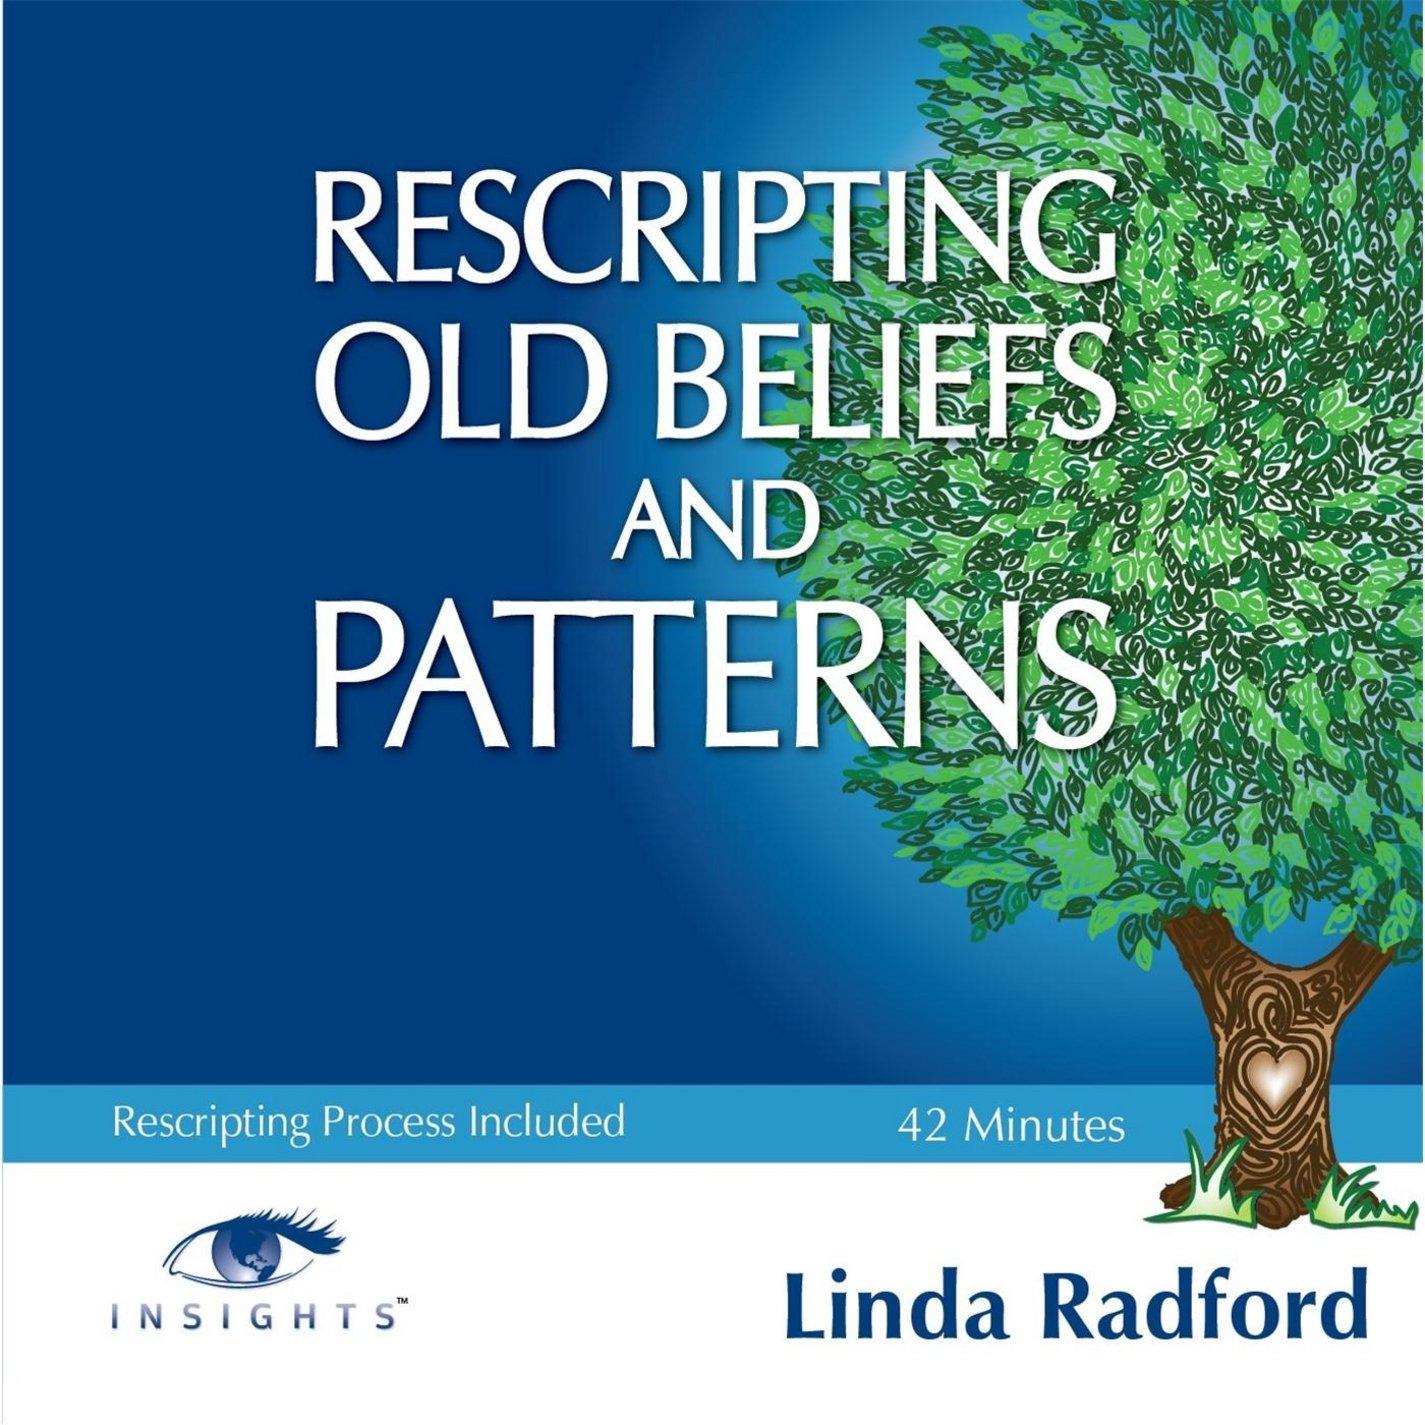 Rescripting Old Beliefs Patterns online Seasonal Wrap Introduction shop and